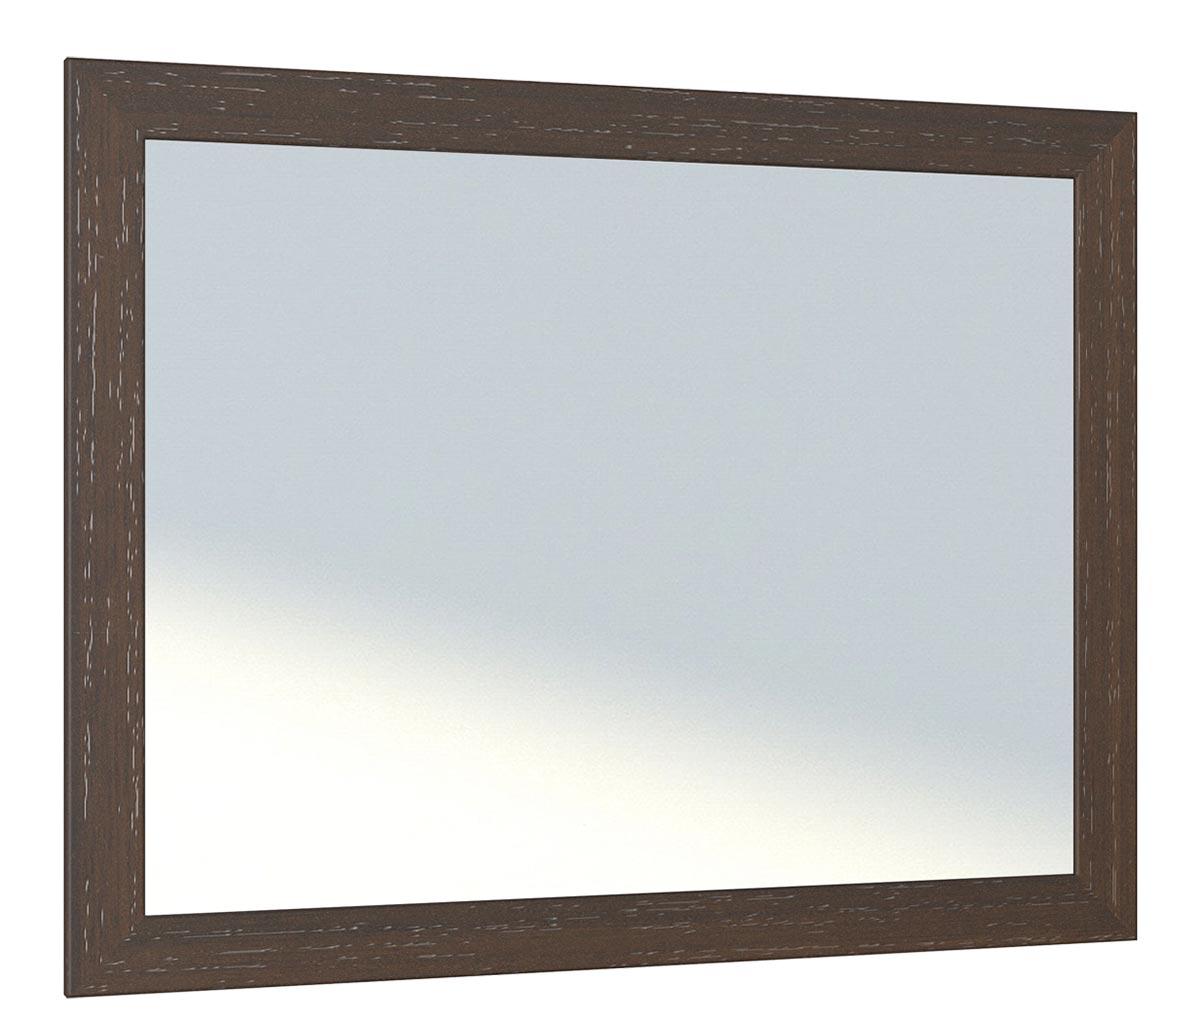 Зеркало Компасс Изабель, ИЗ-05